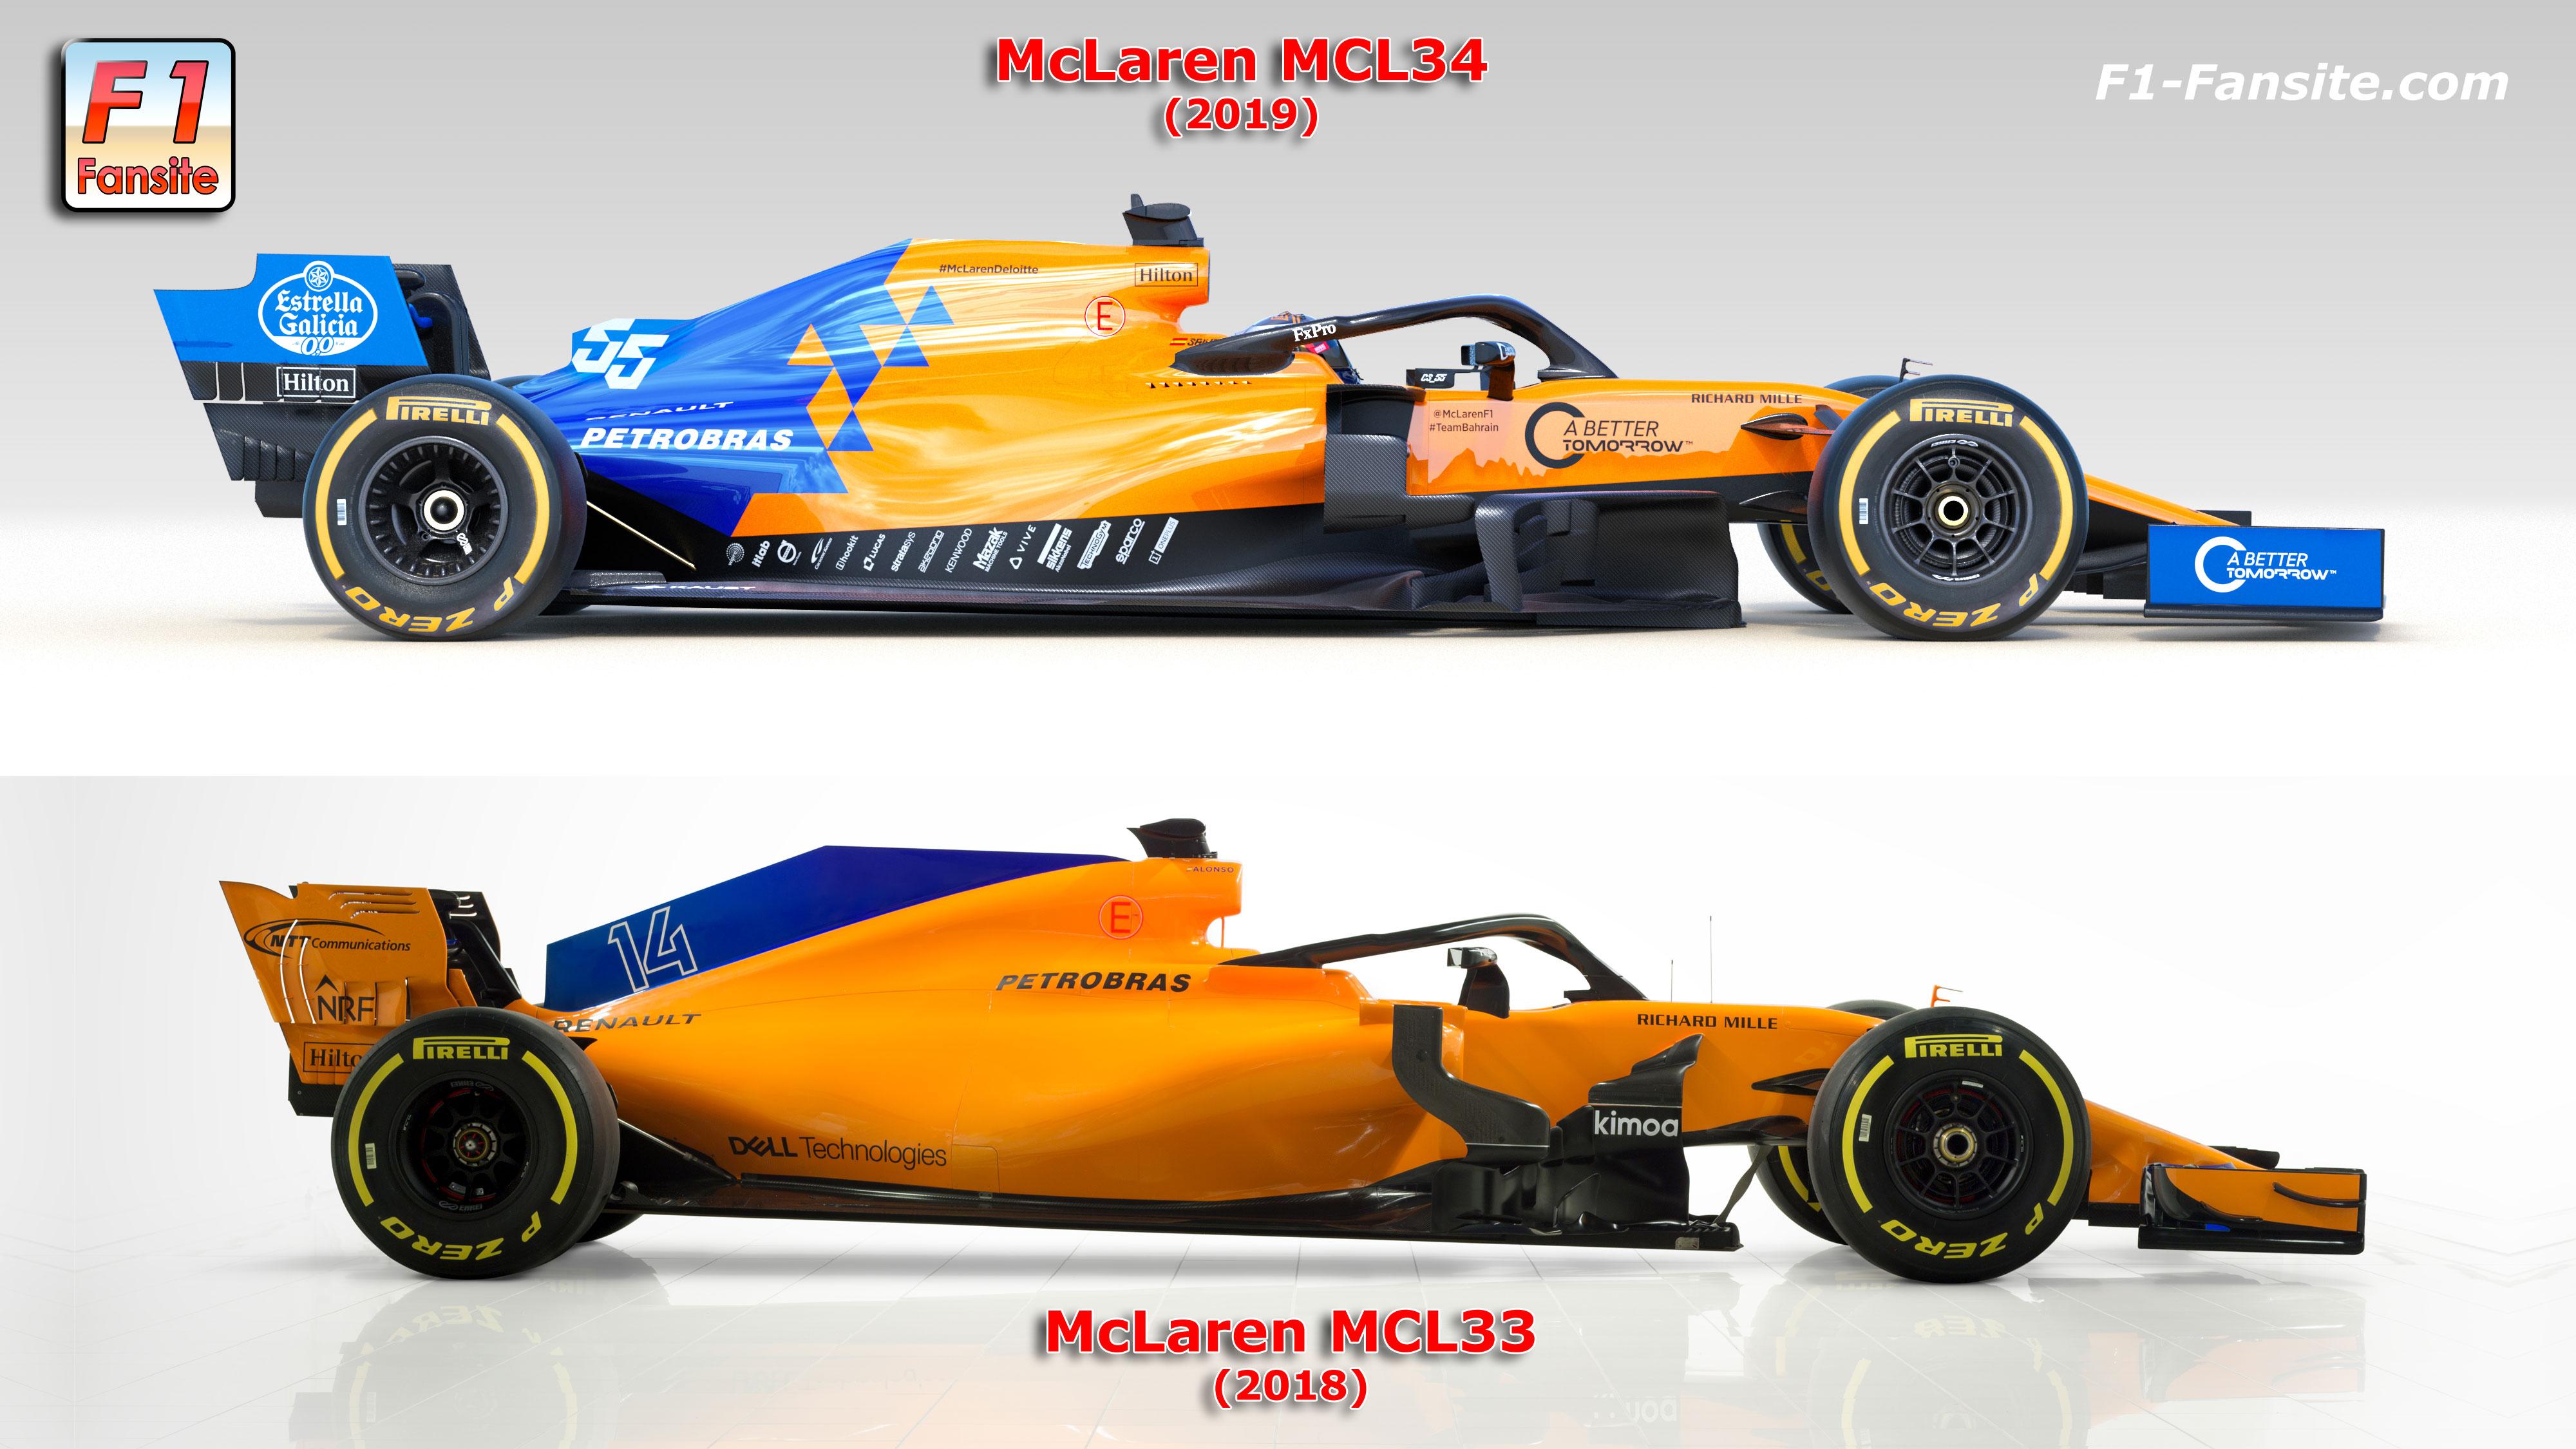 Mclaren Mcl34 Technical Specification